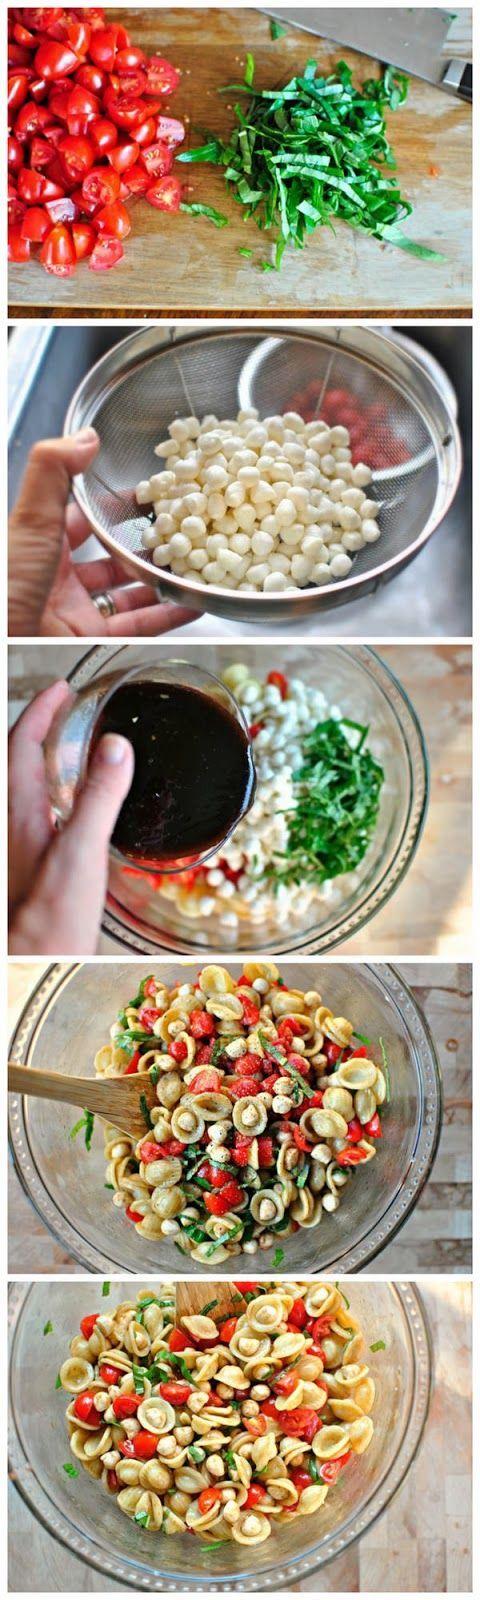 Wg grinders pasta salad recipe